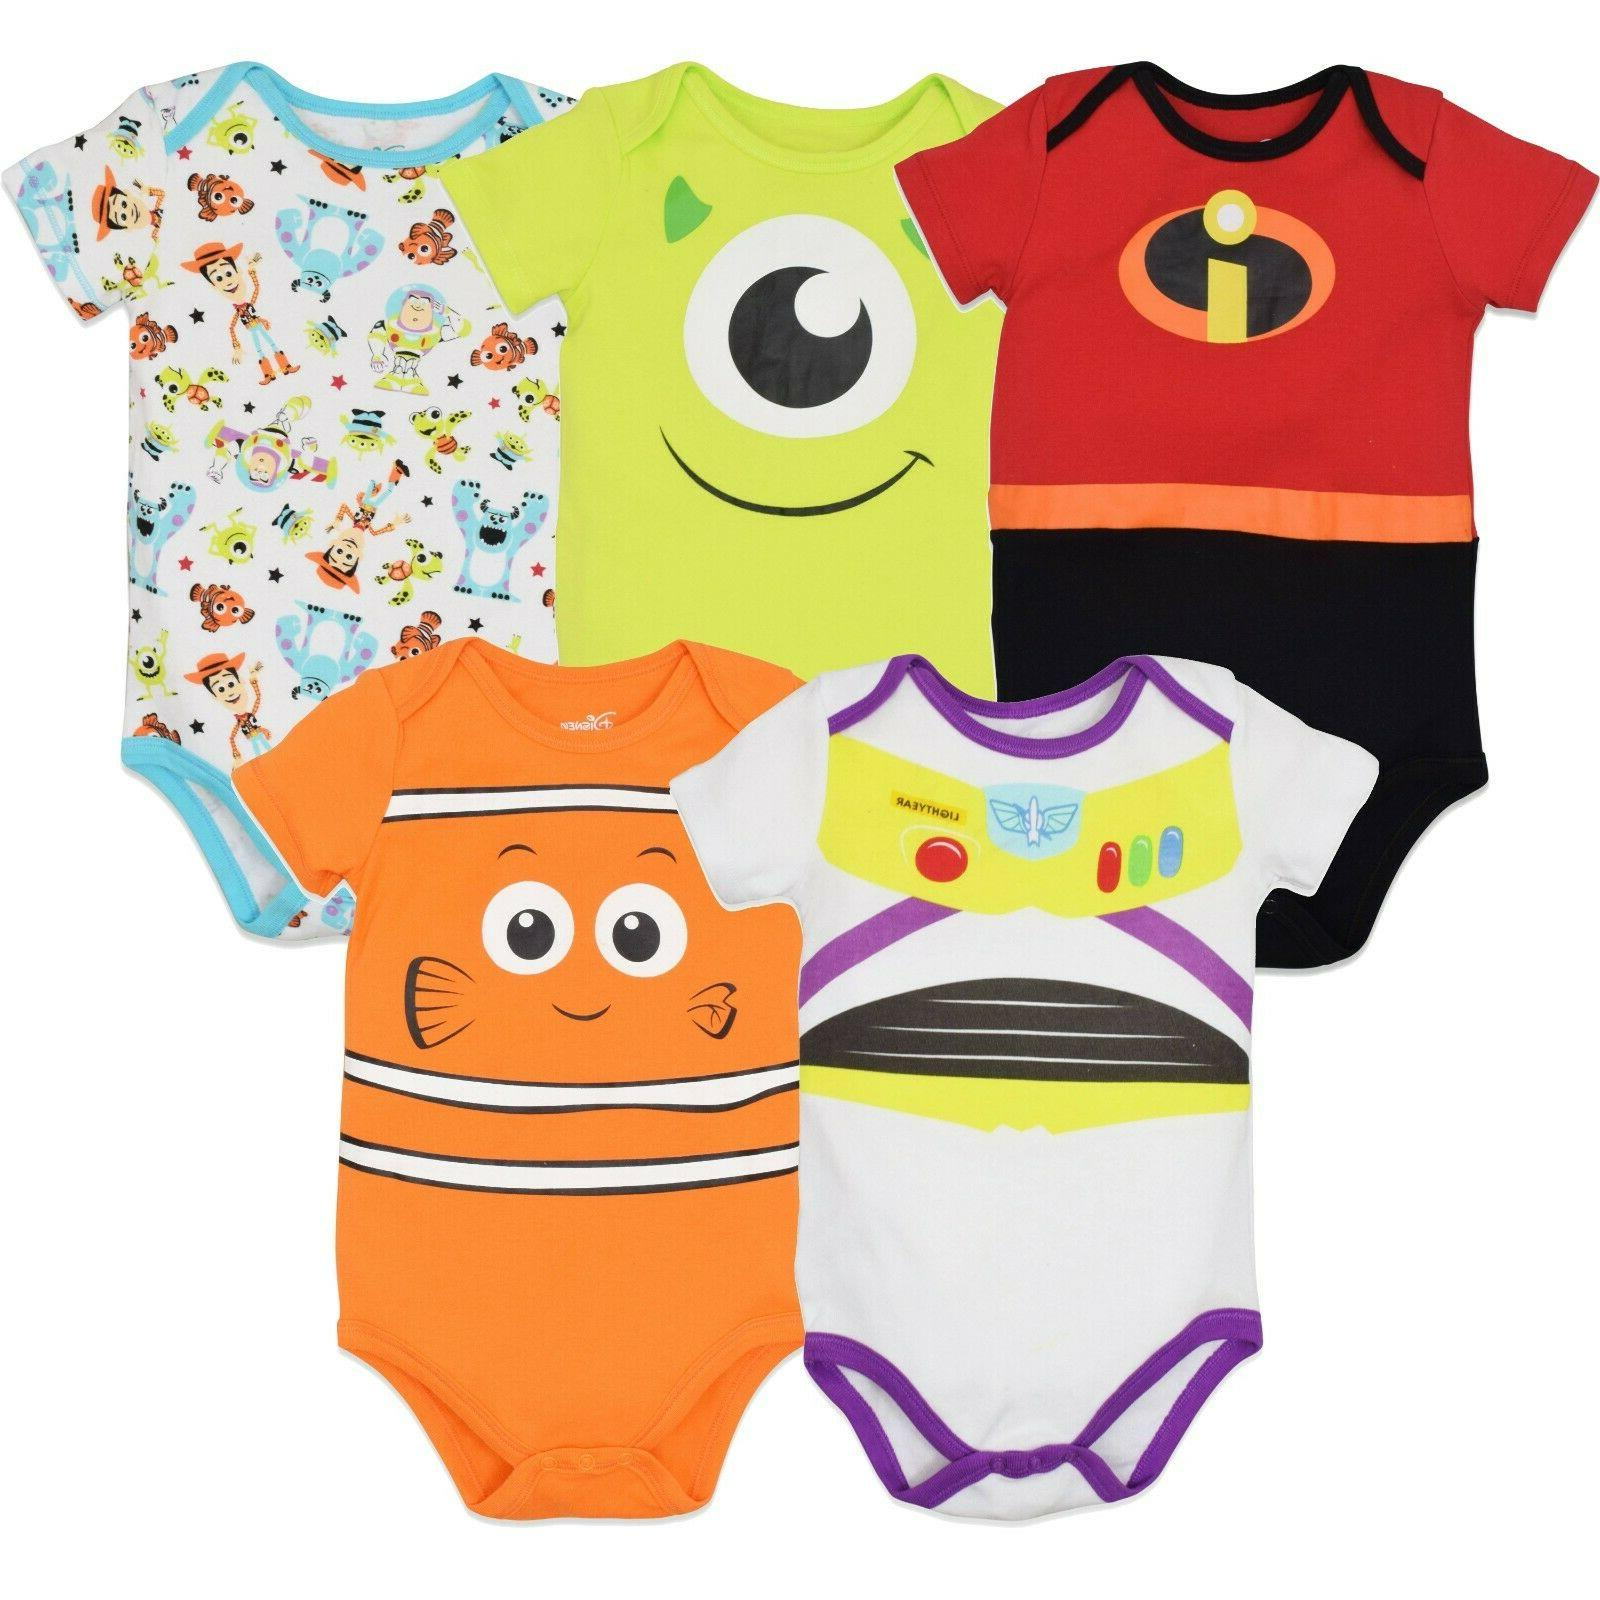 pixar baby boy girl 5 pack bodysuits